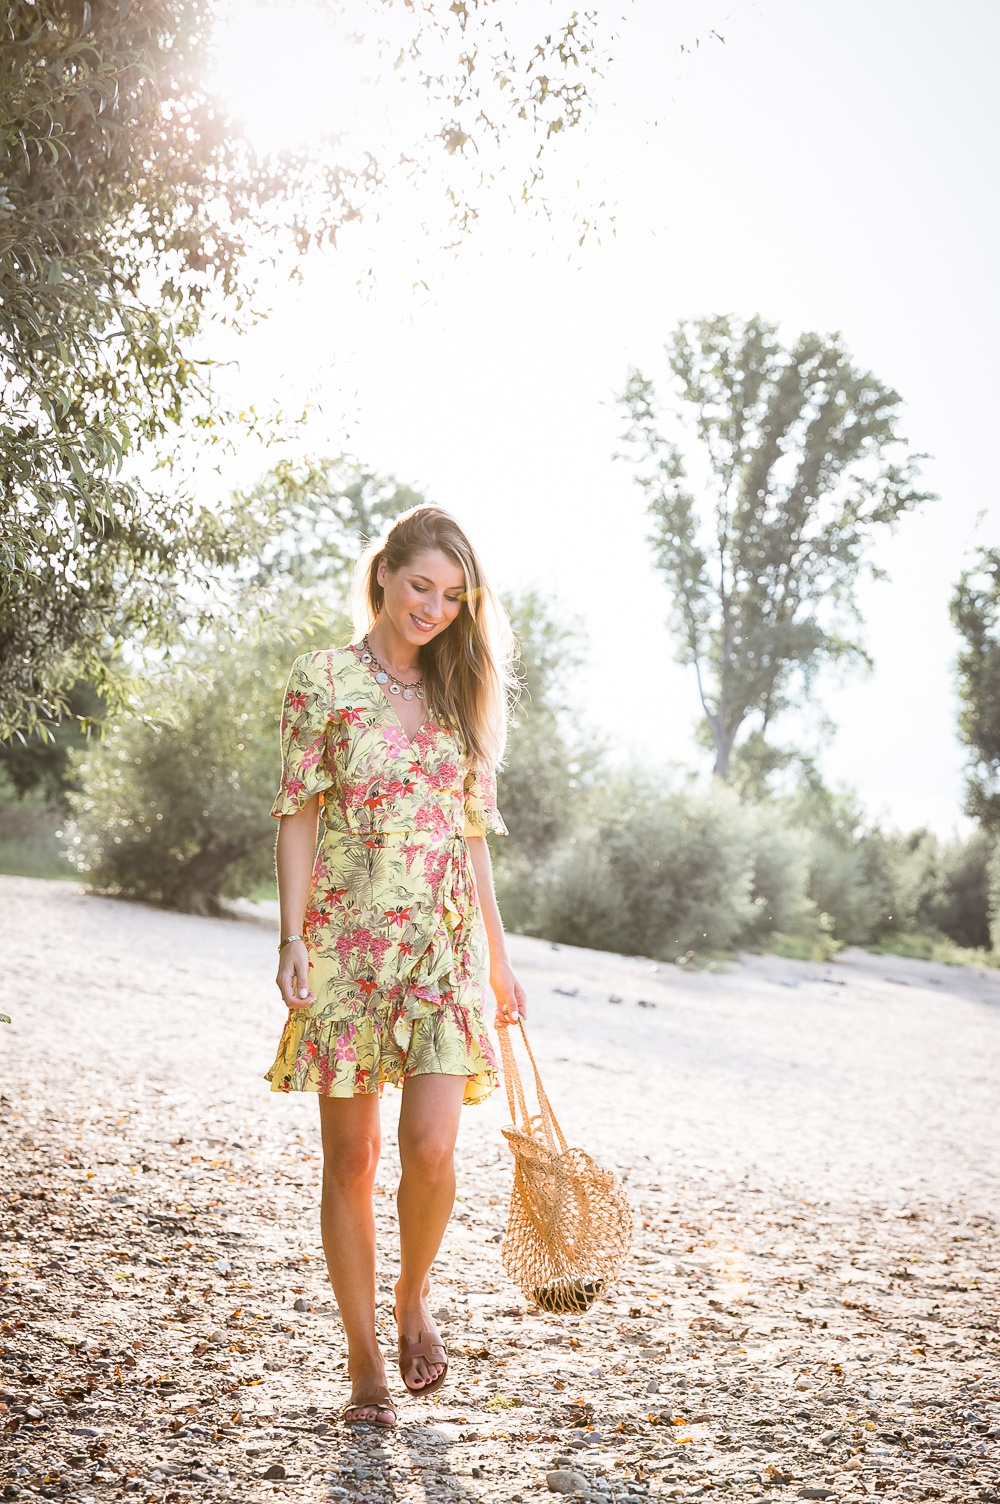 La Dolce Vita :: Yellow dress & my new beach bag